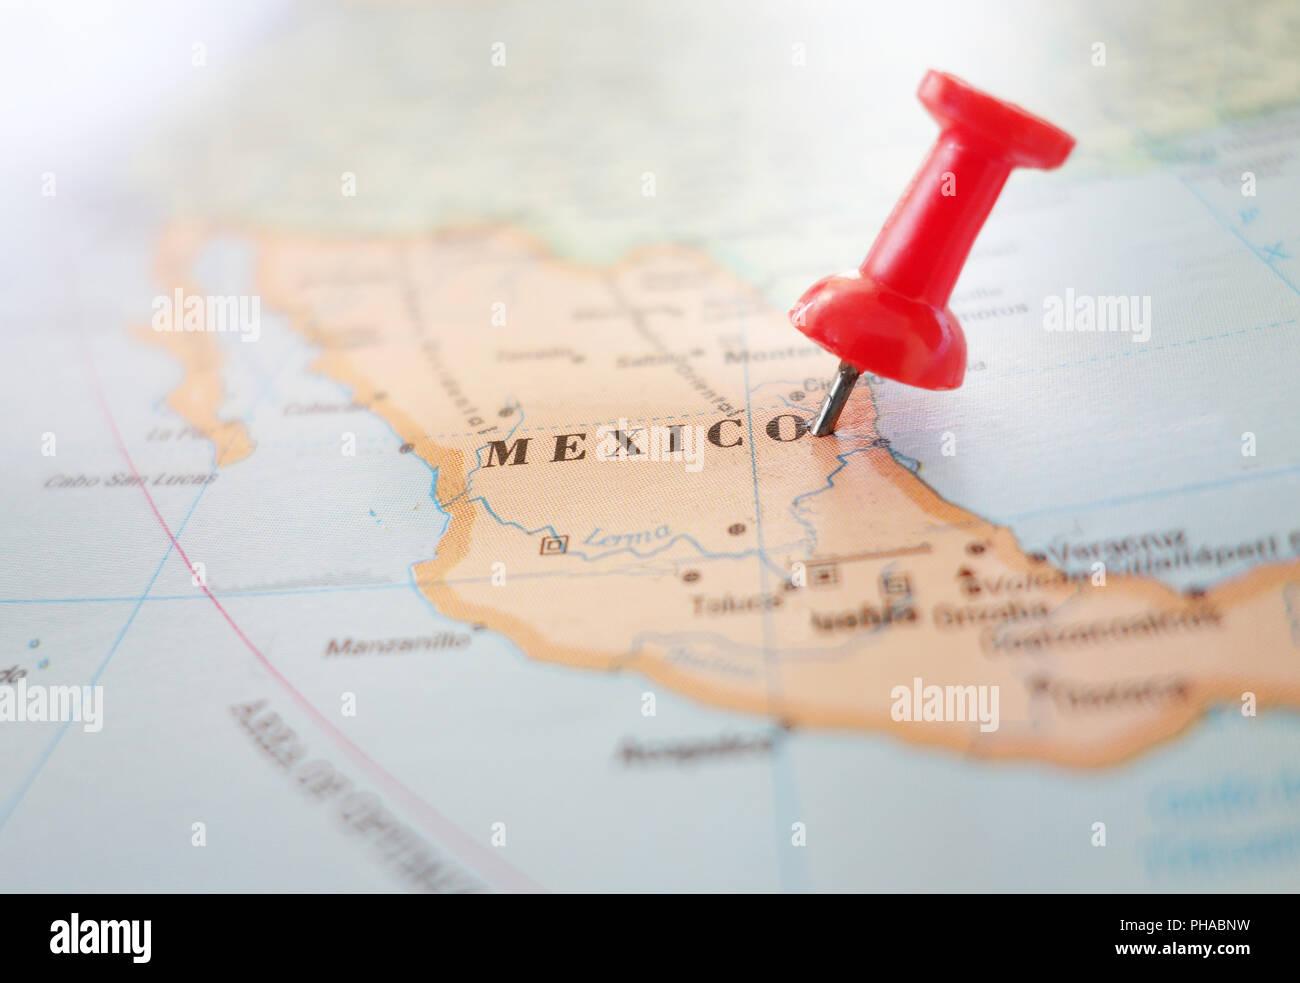 Mexico Map Pin Stock Photos & Mexico Map Pin Stock Images - Alamy